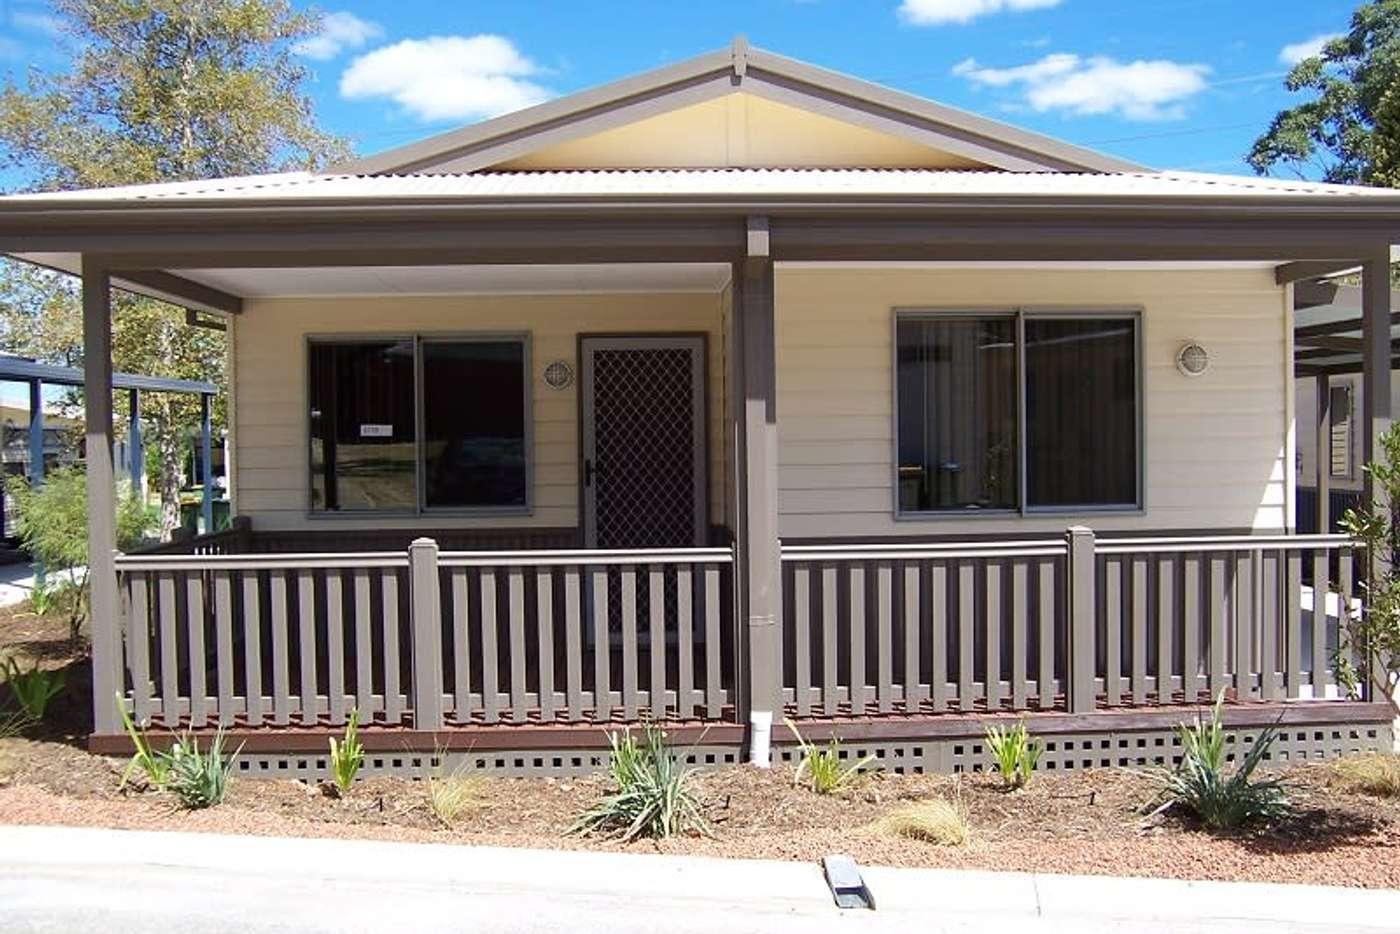 Main view of Homely house listing, 219/91 Benara Road, Caversham WA 6055